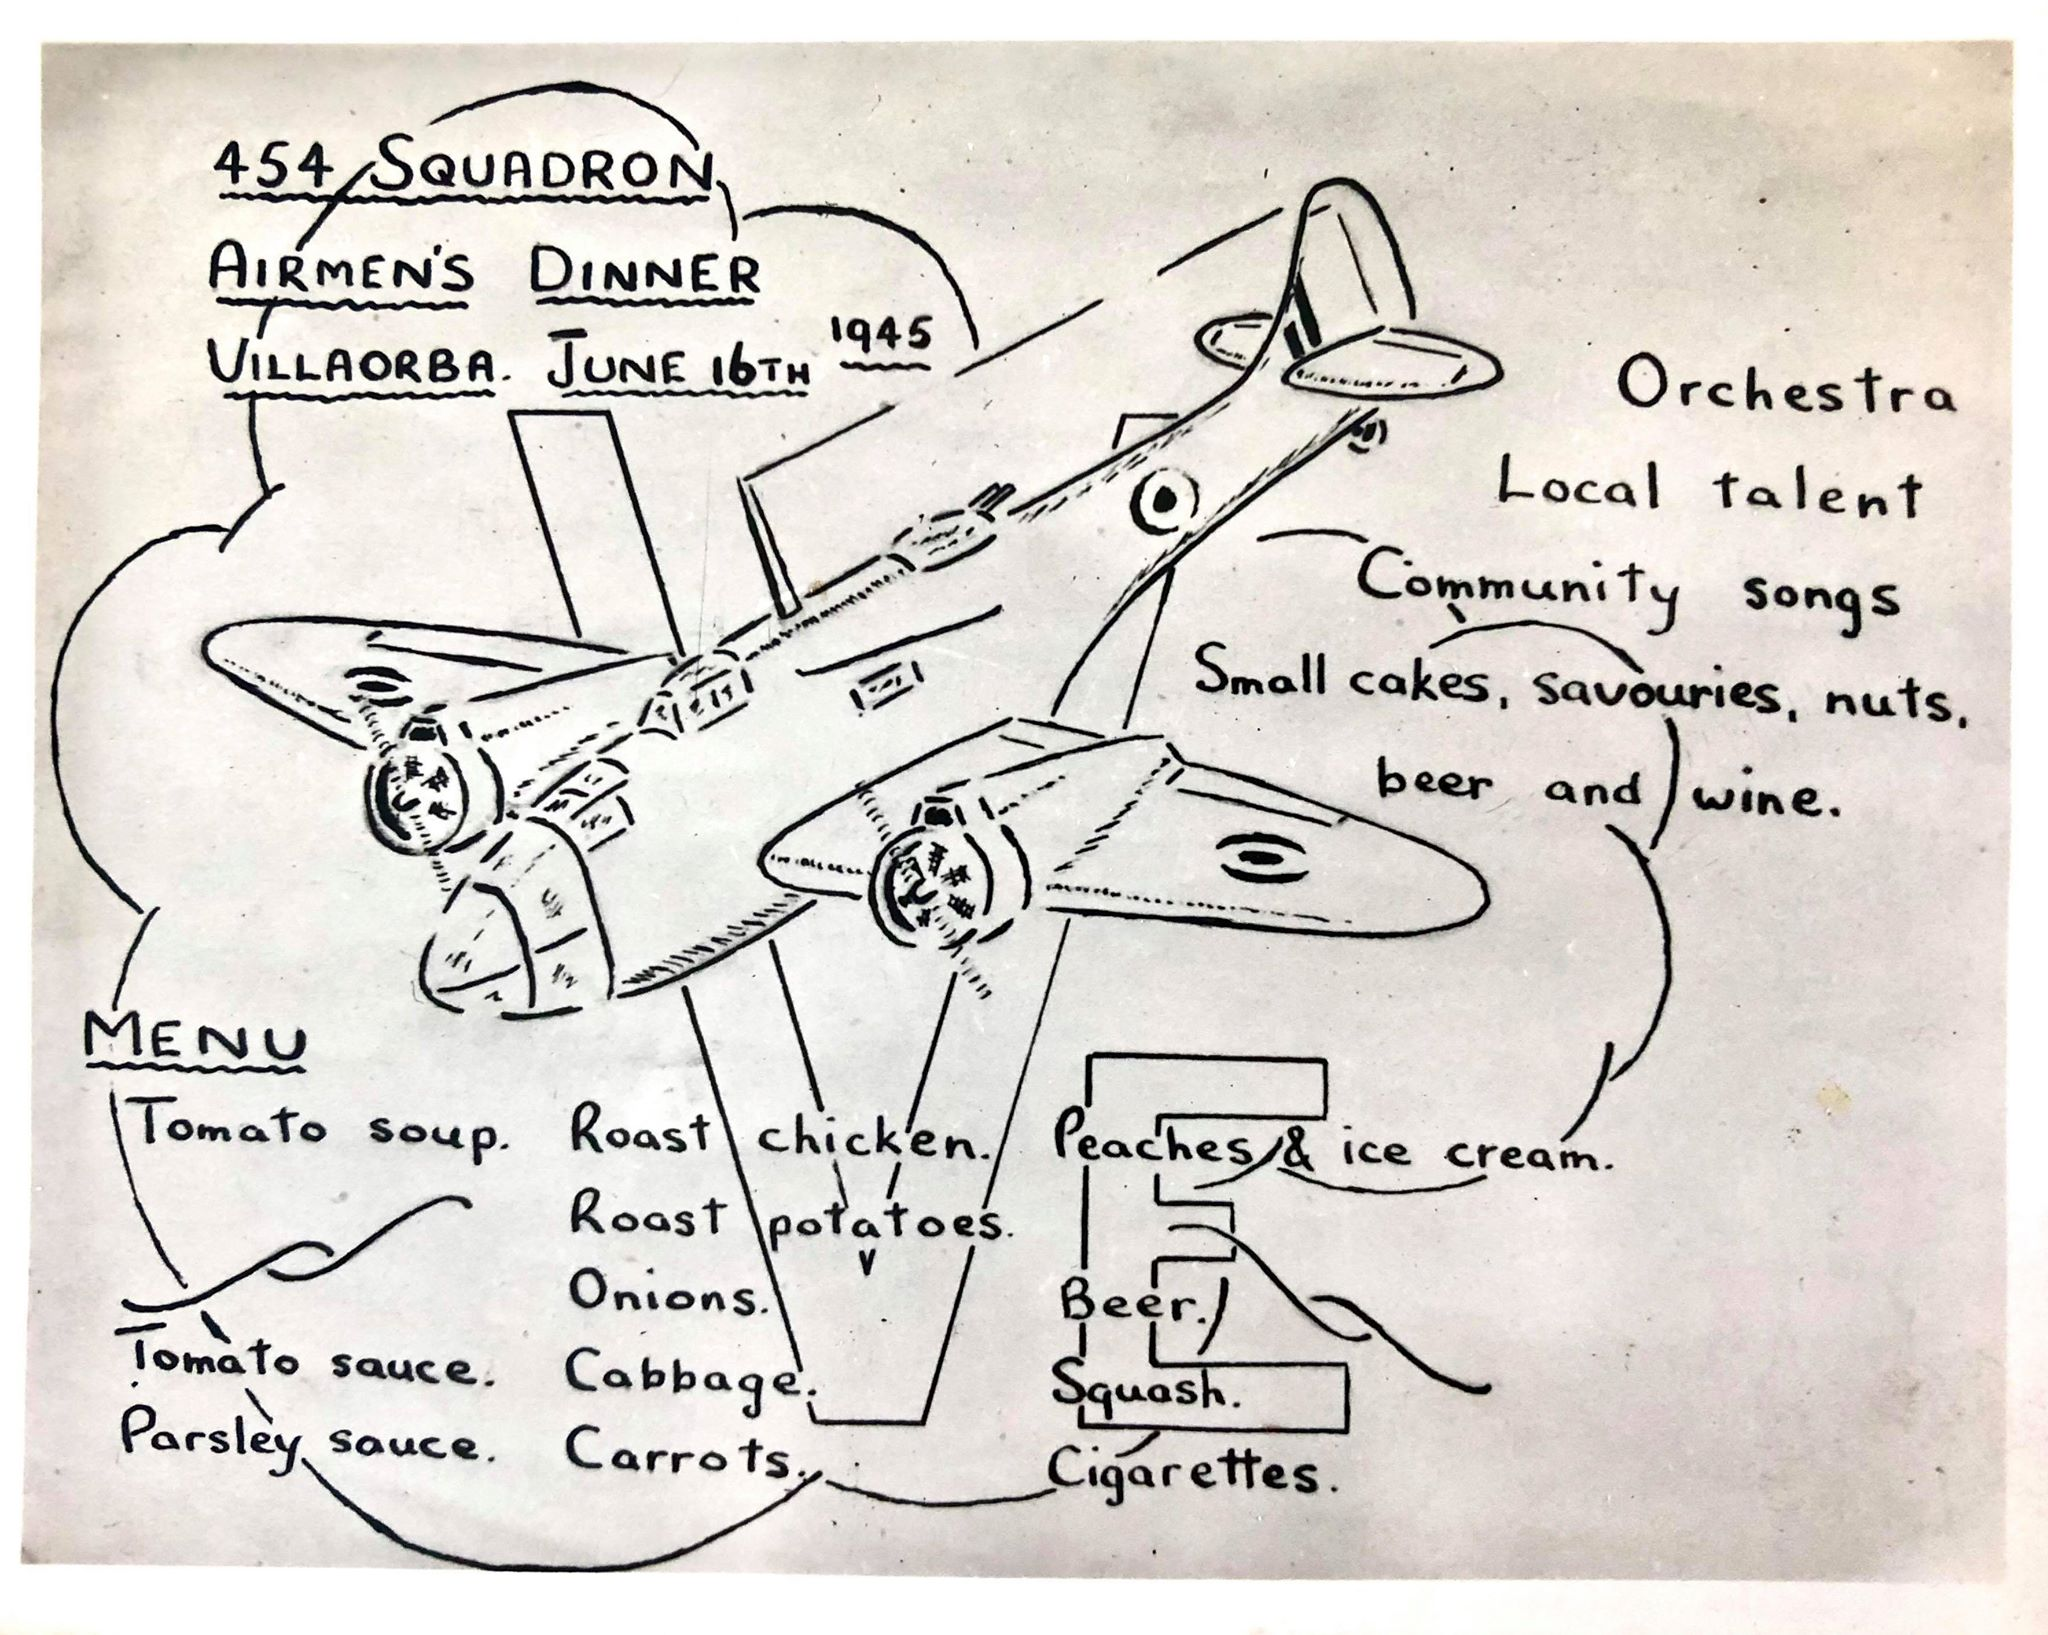 454 Squadron Airmen dinner 12  Jun Villa